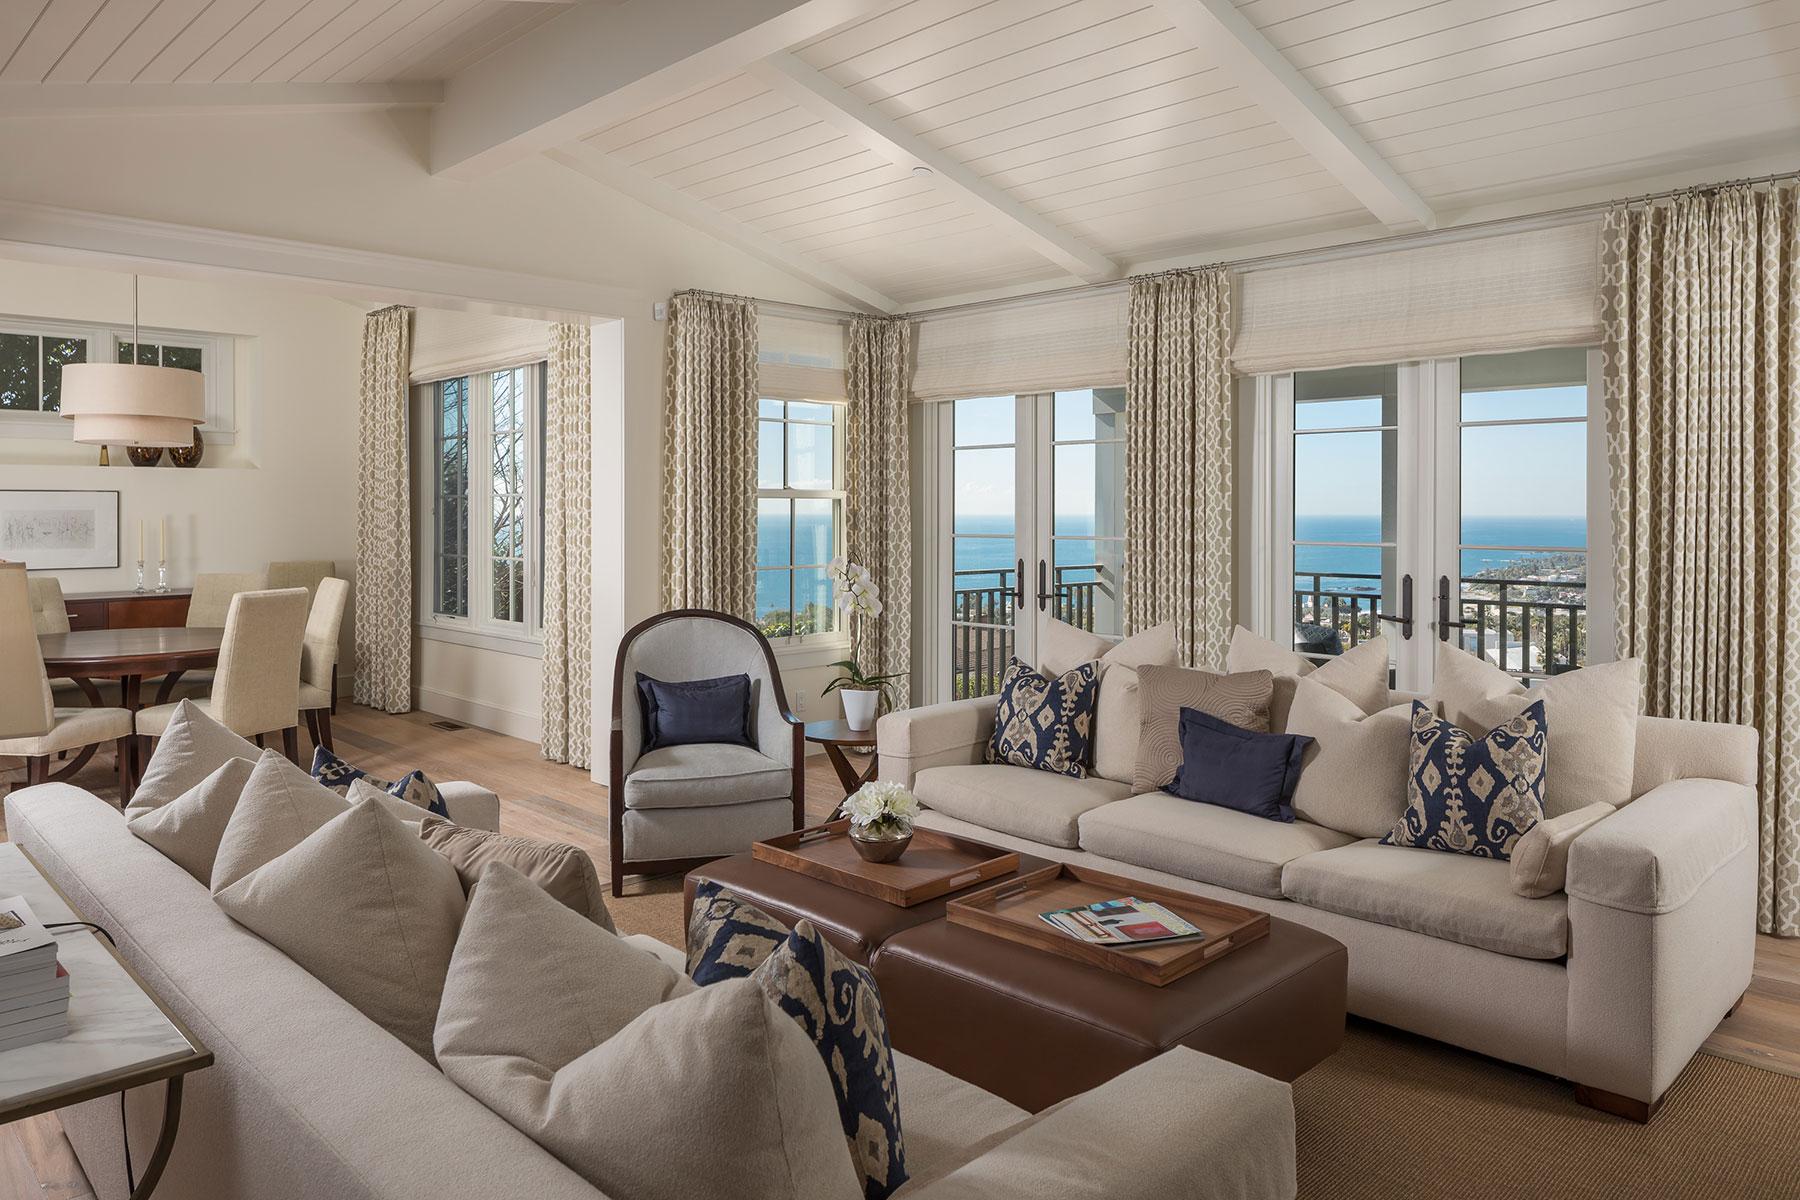 Single Family Home for Sale at 745 Buena Vista Way Laguna Beach, California, 92651 United States